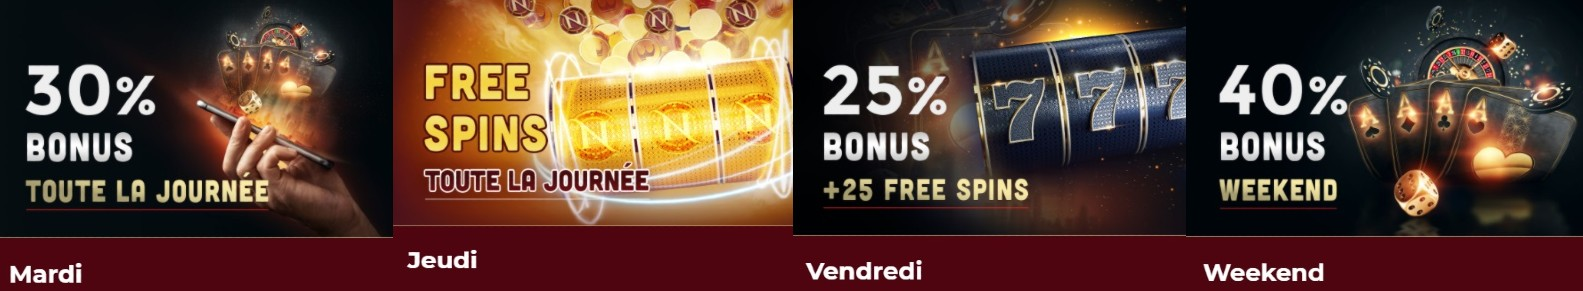 Les promotions disponibles à Nevadawin casino